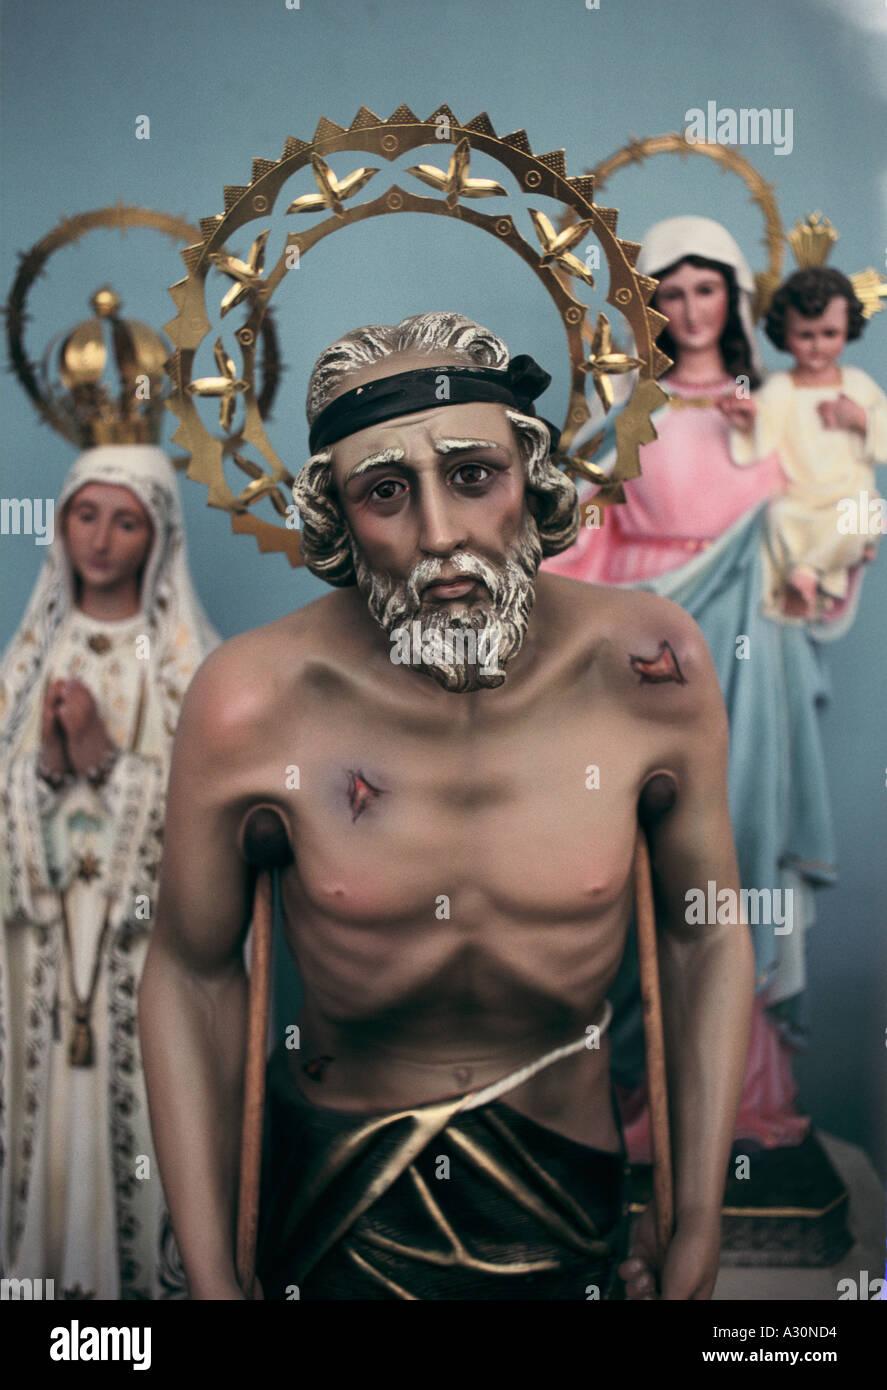 Lifelike statue of Jesus Christ, 'Little Havana', Miami, USA - Stock Image